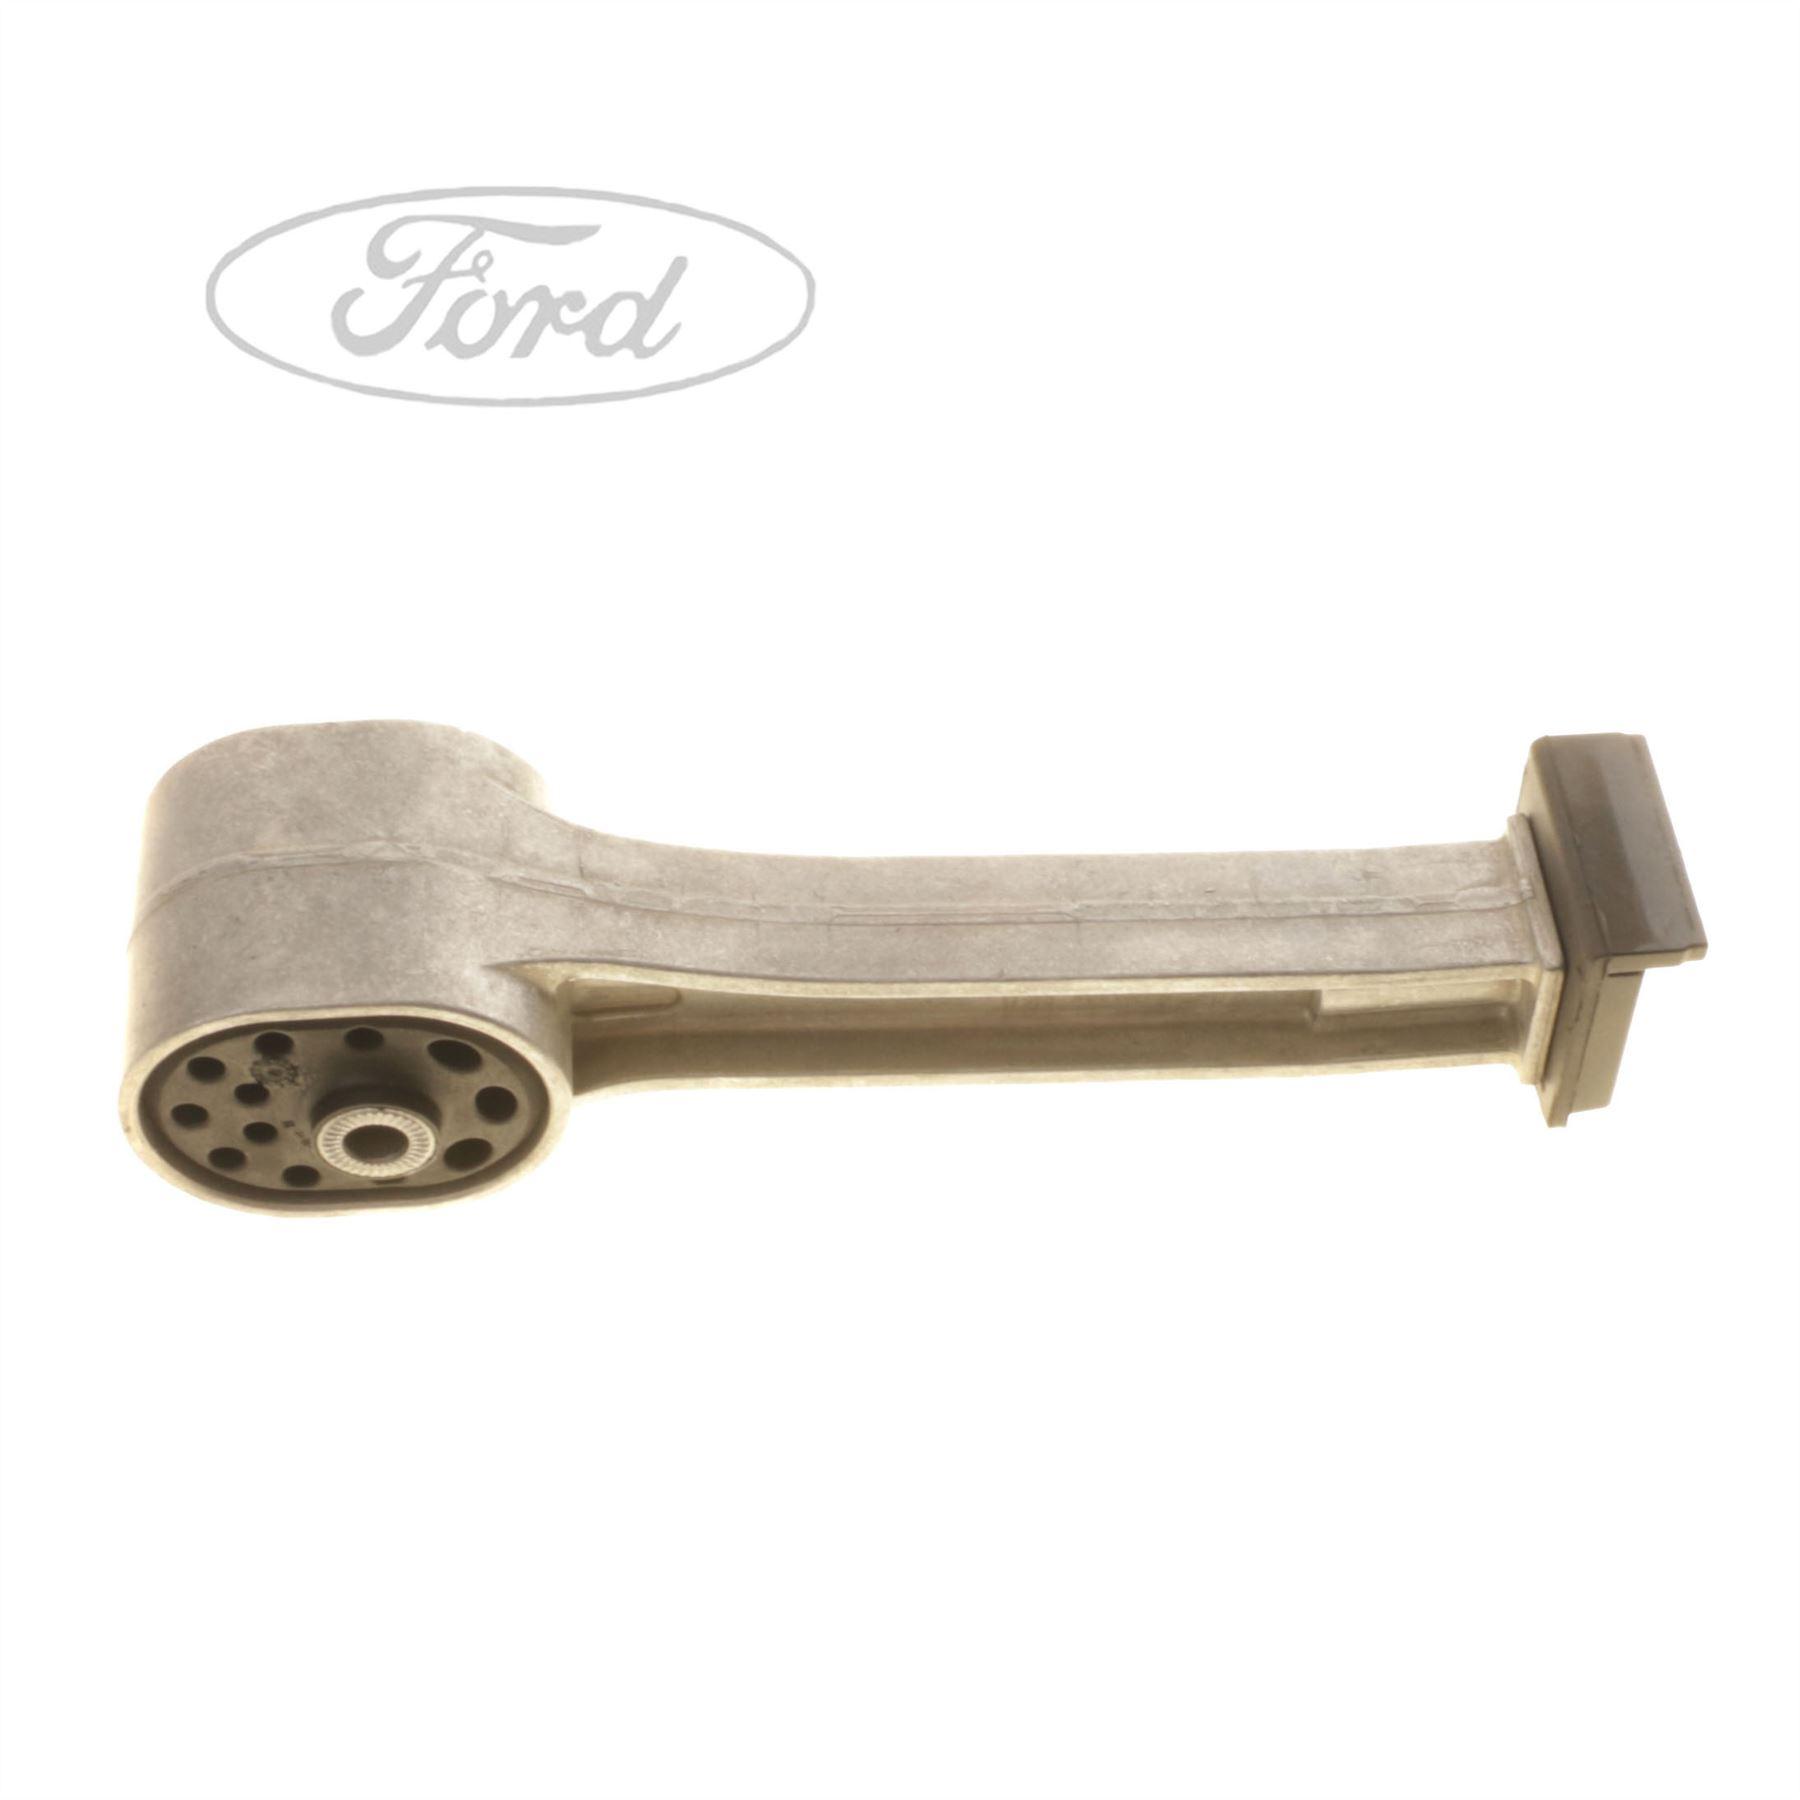 Genuine Ford Galaxy MK1 2.0 2.3 Gearbox Engine Mounting Bracket ...